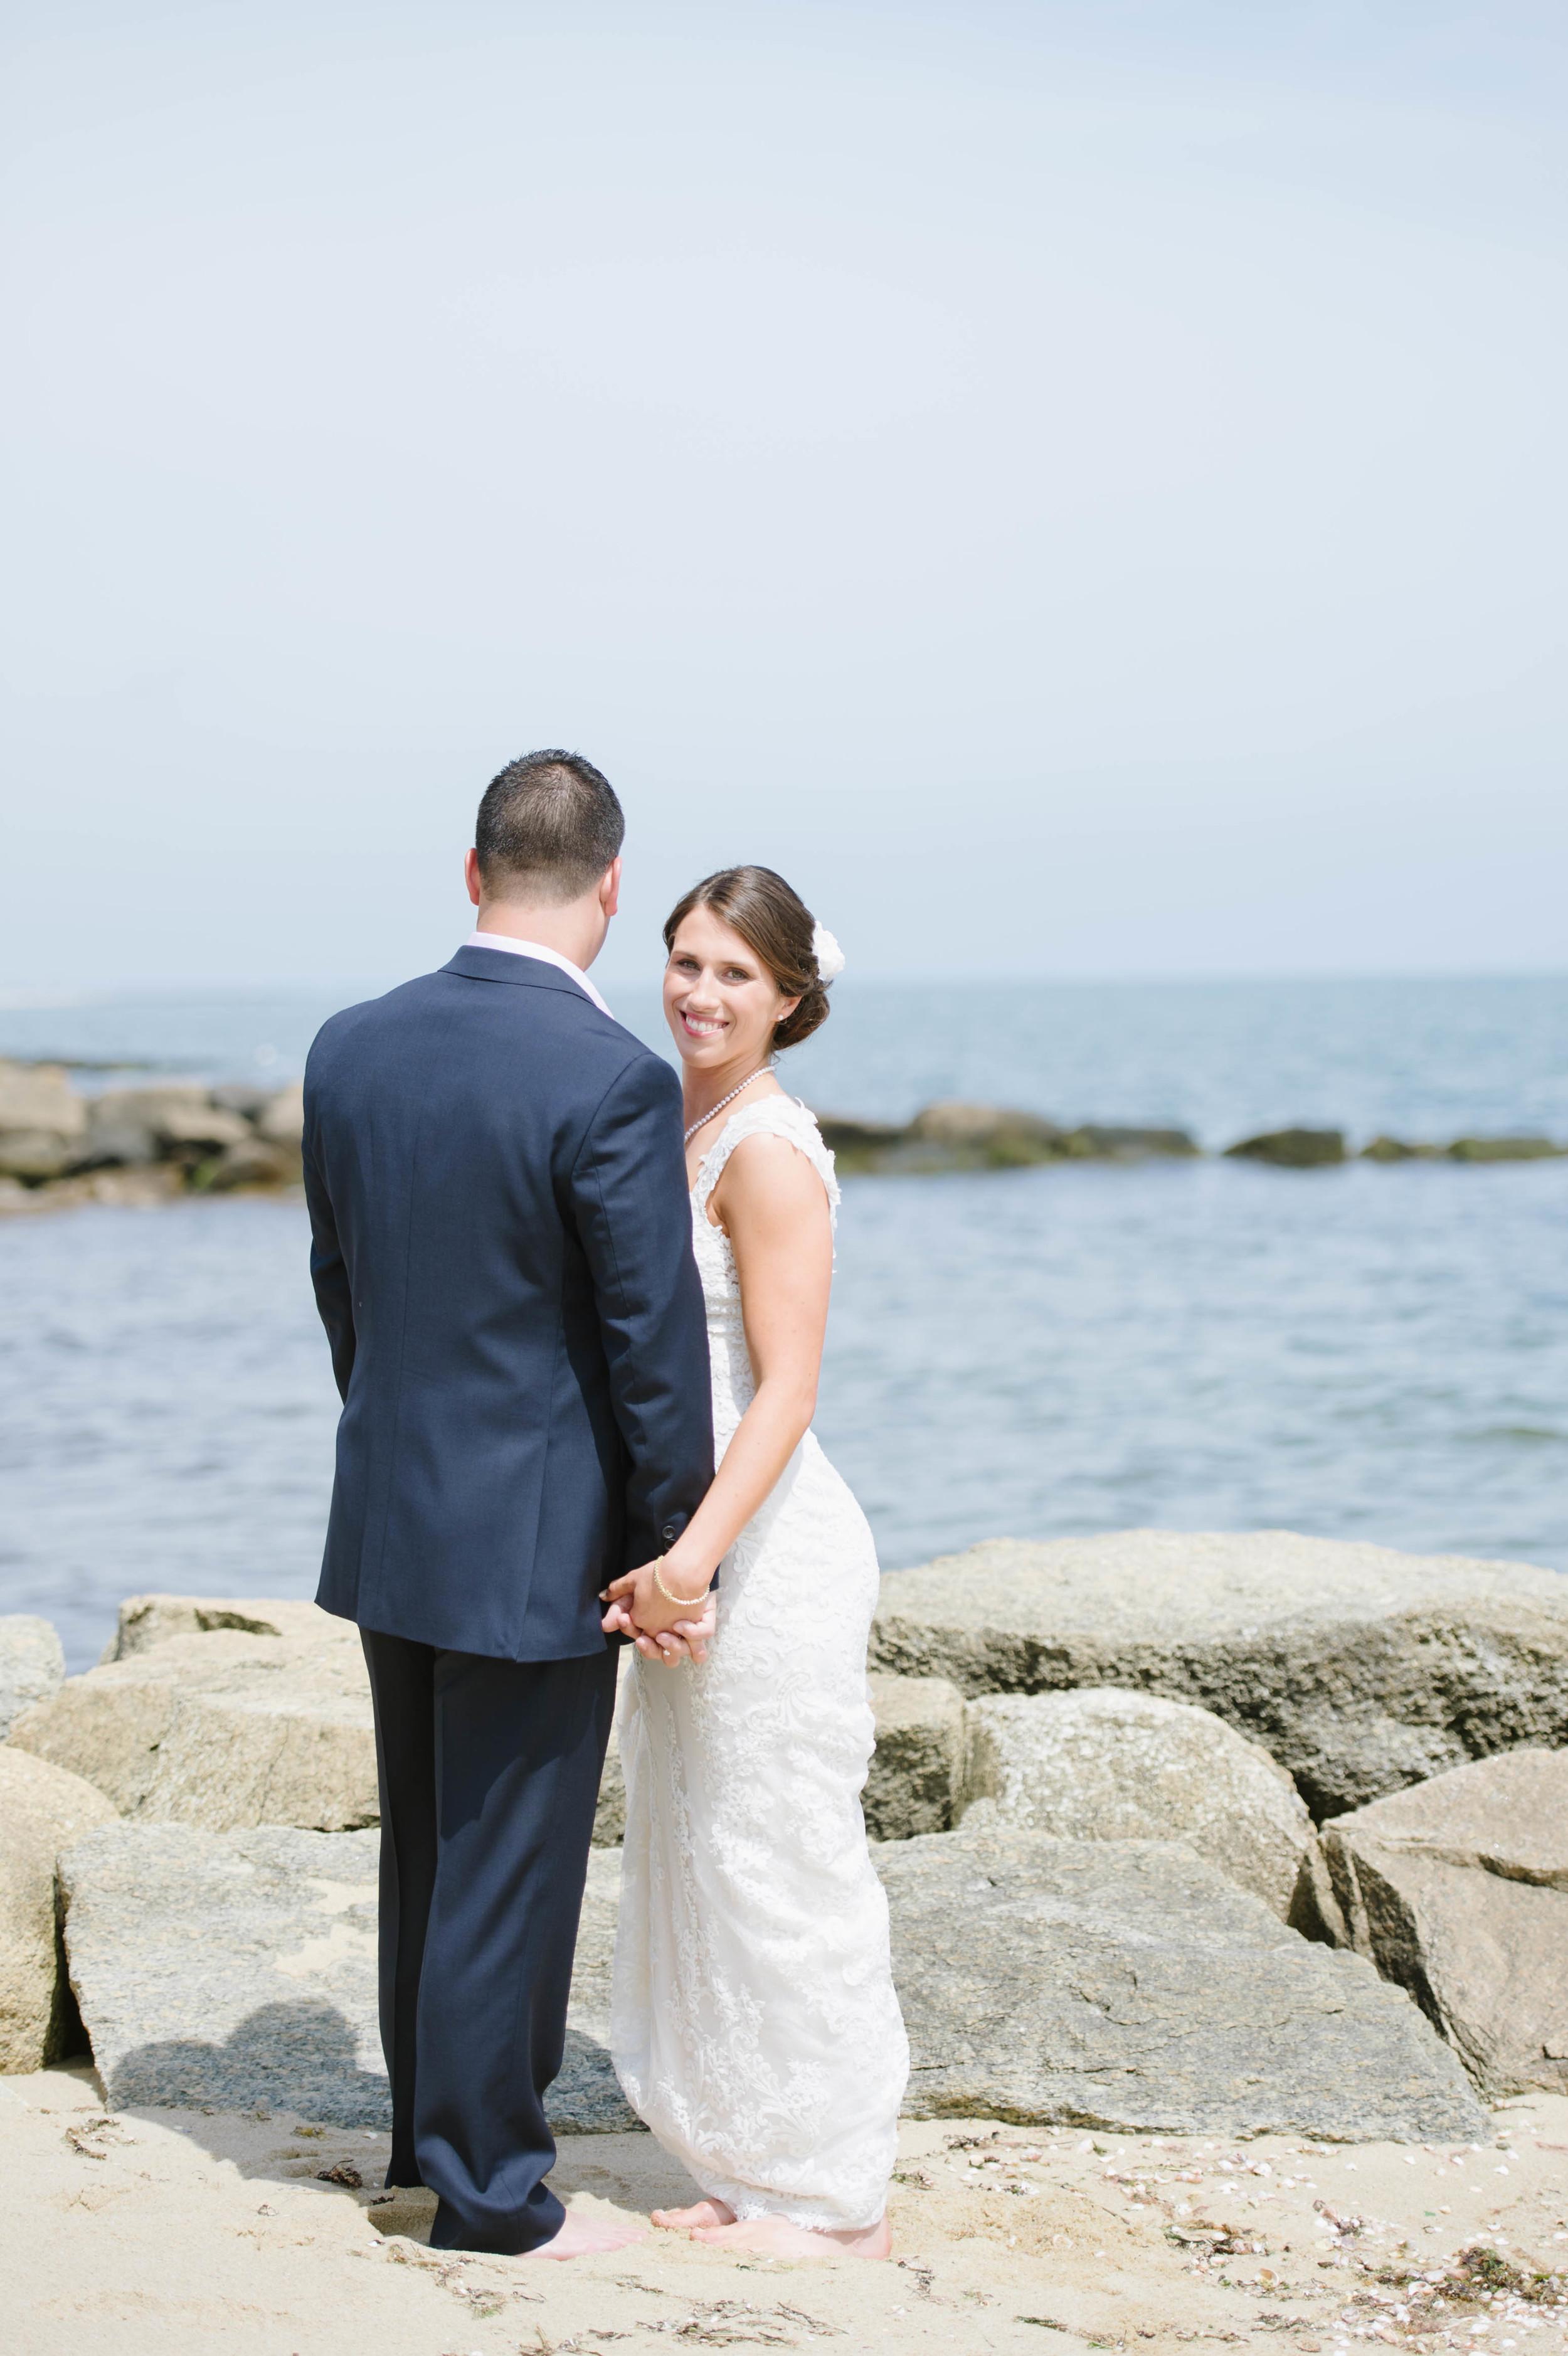 Pelham_House_Wedding_Cape_Cod021.jpg